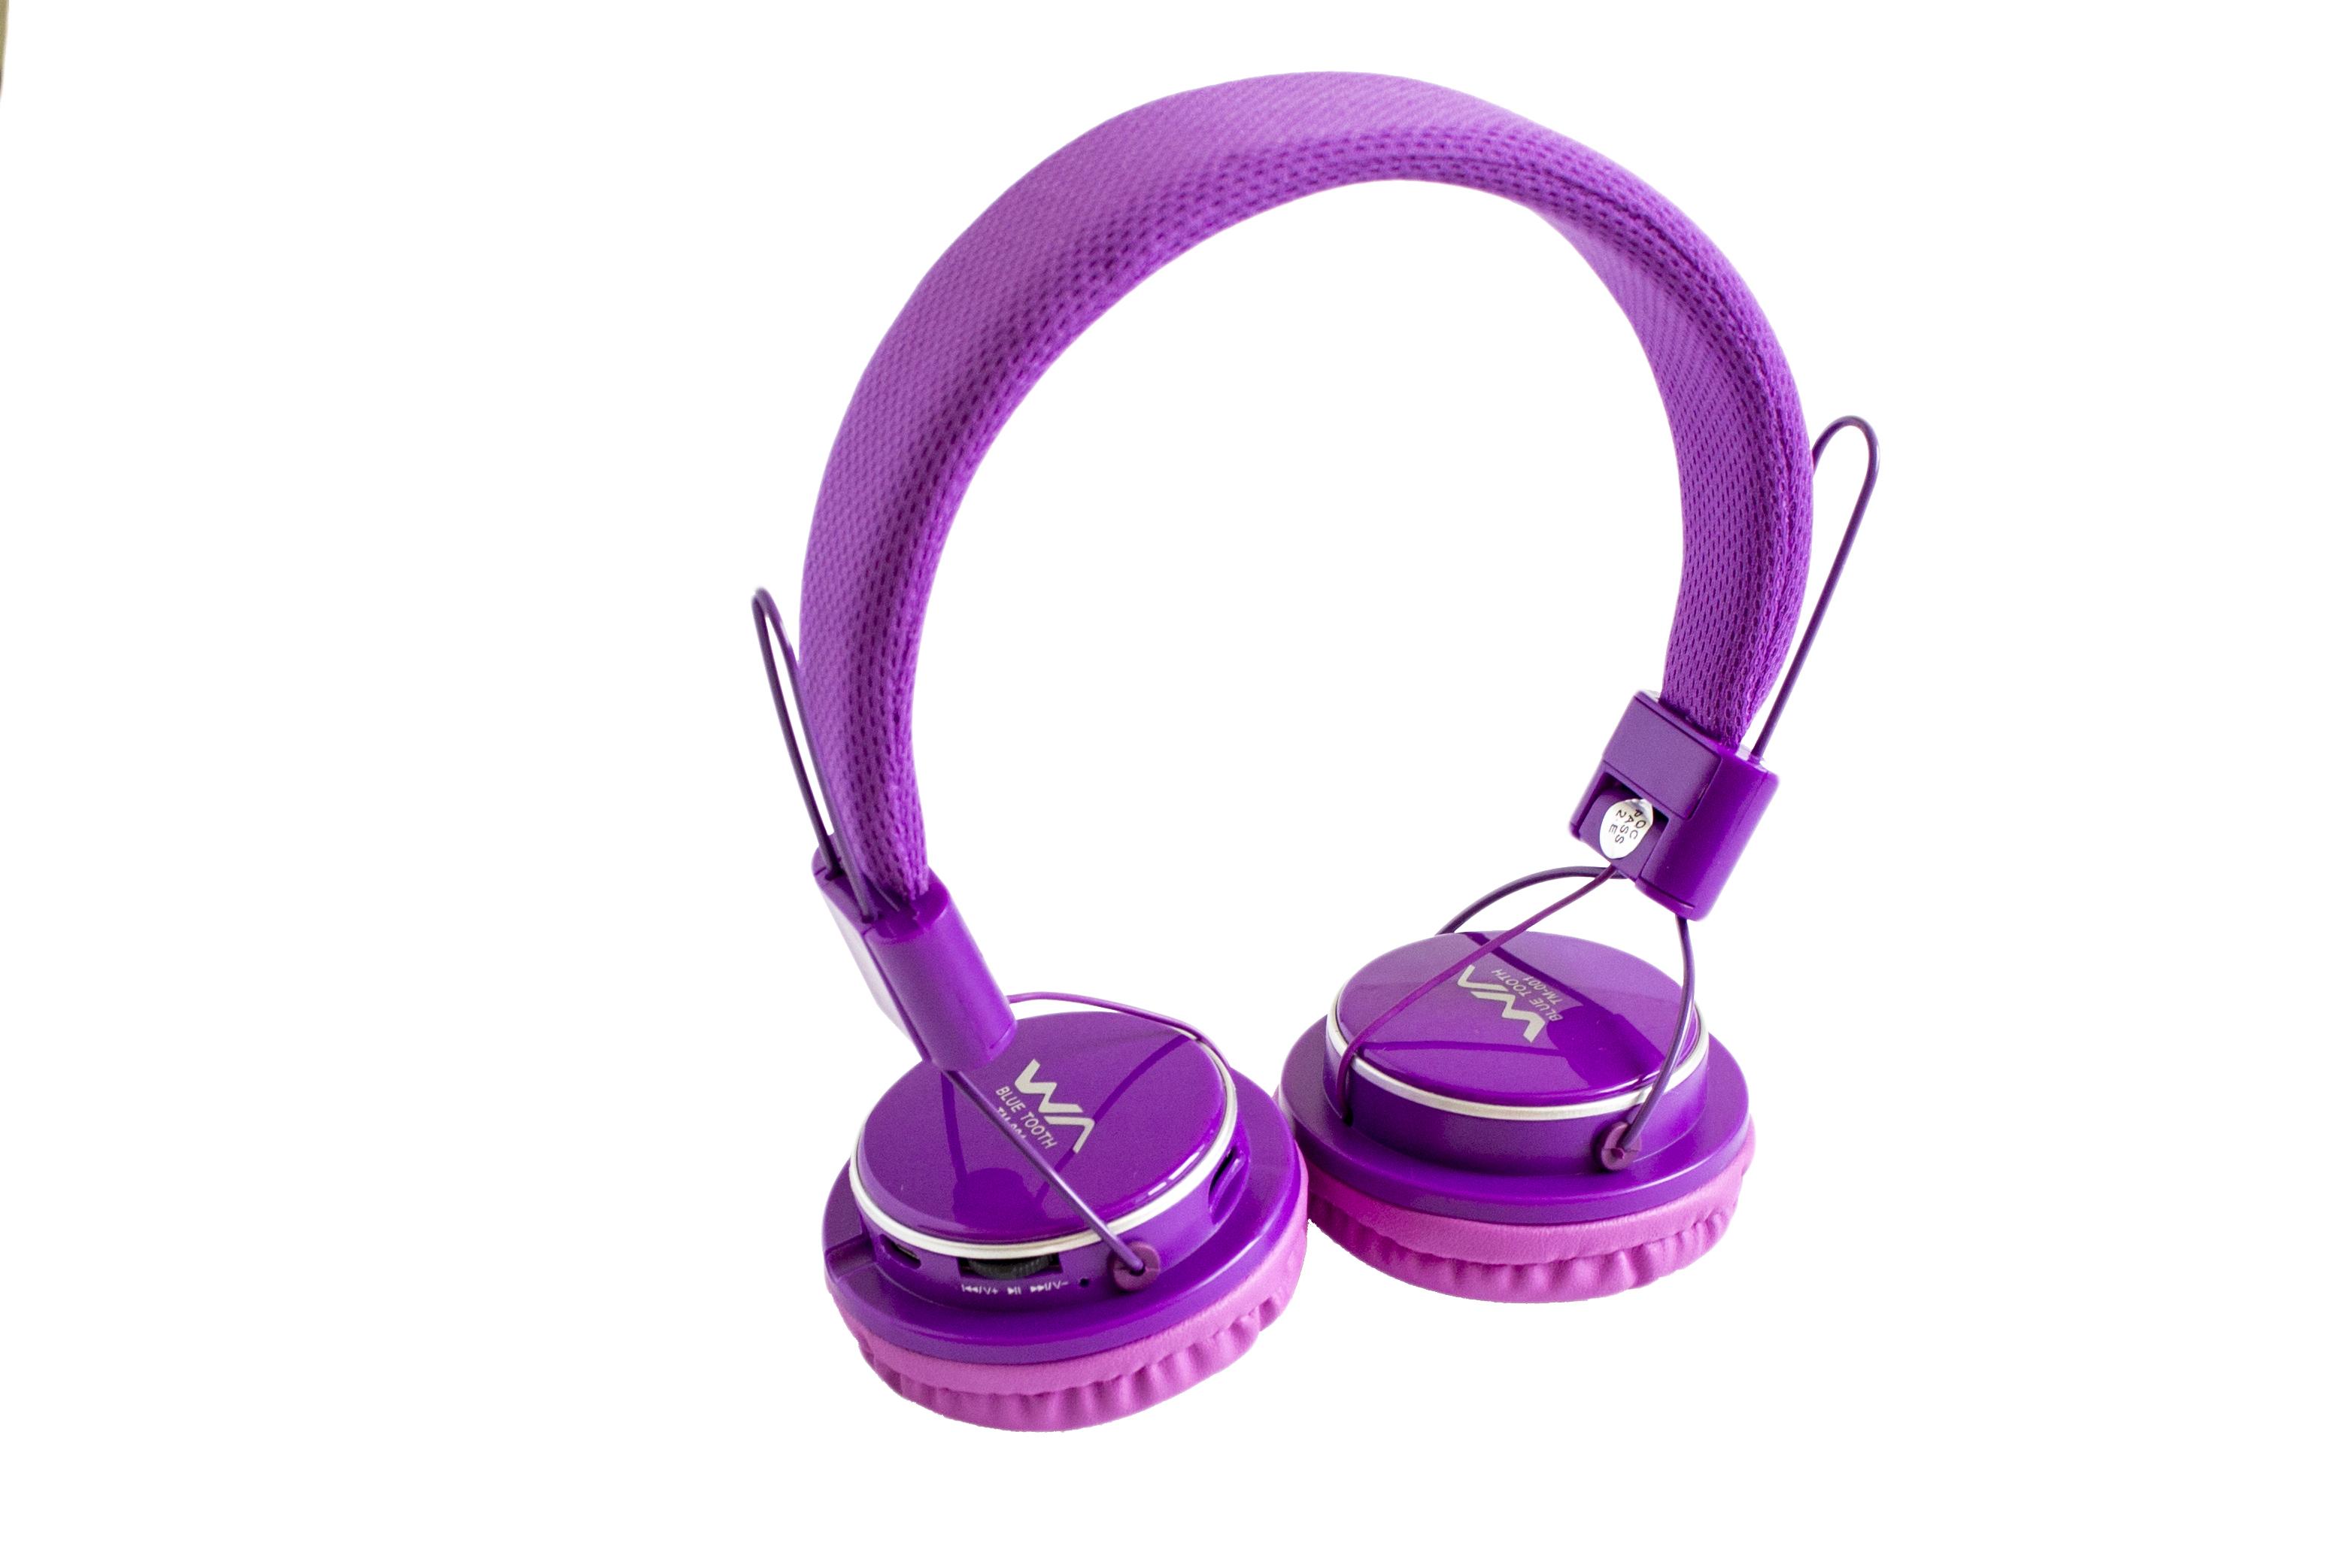 Беспроводные Bluetooth наушники Tymed TM-001 Wireless Headset